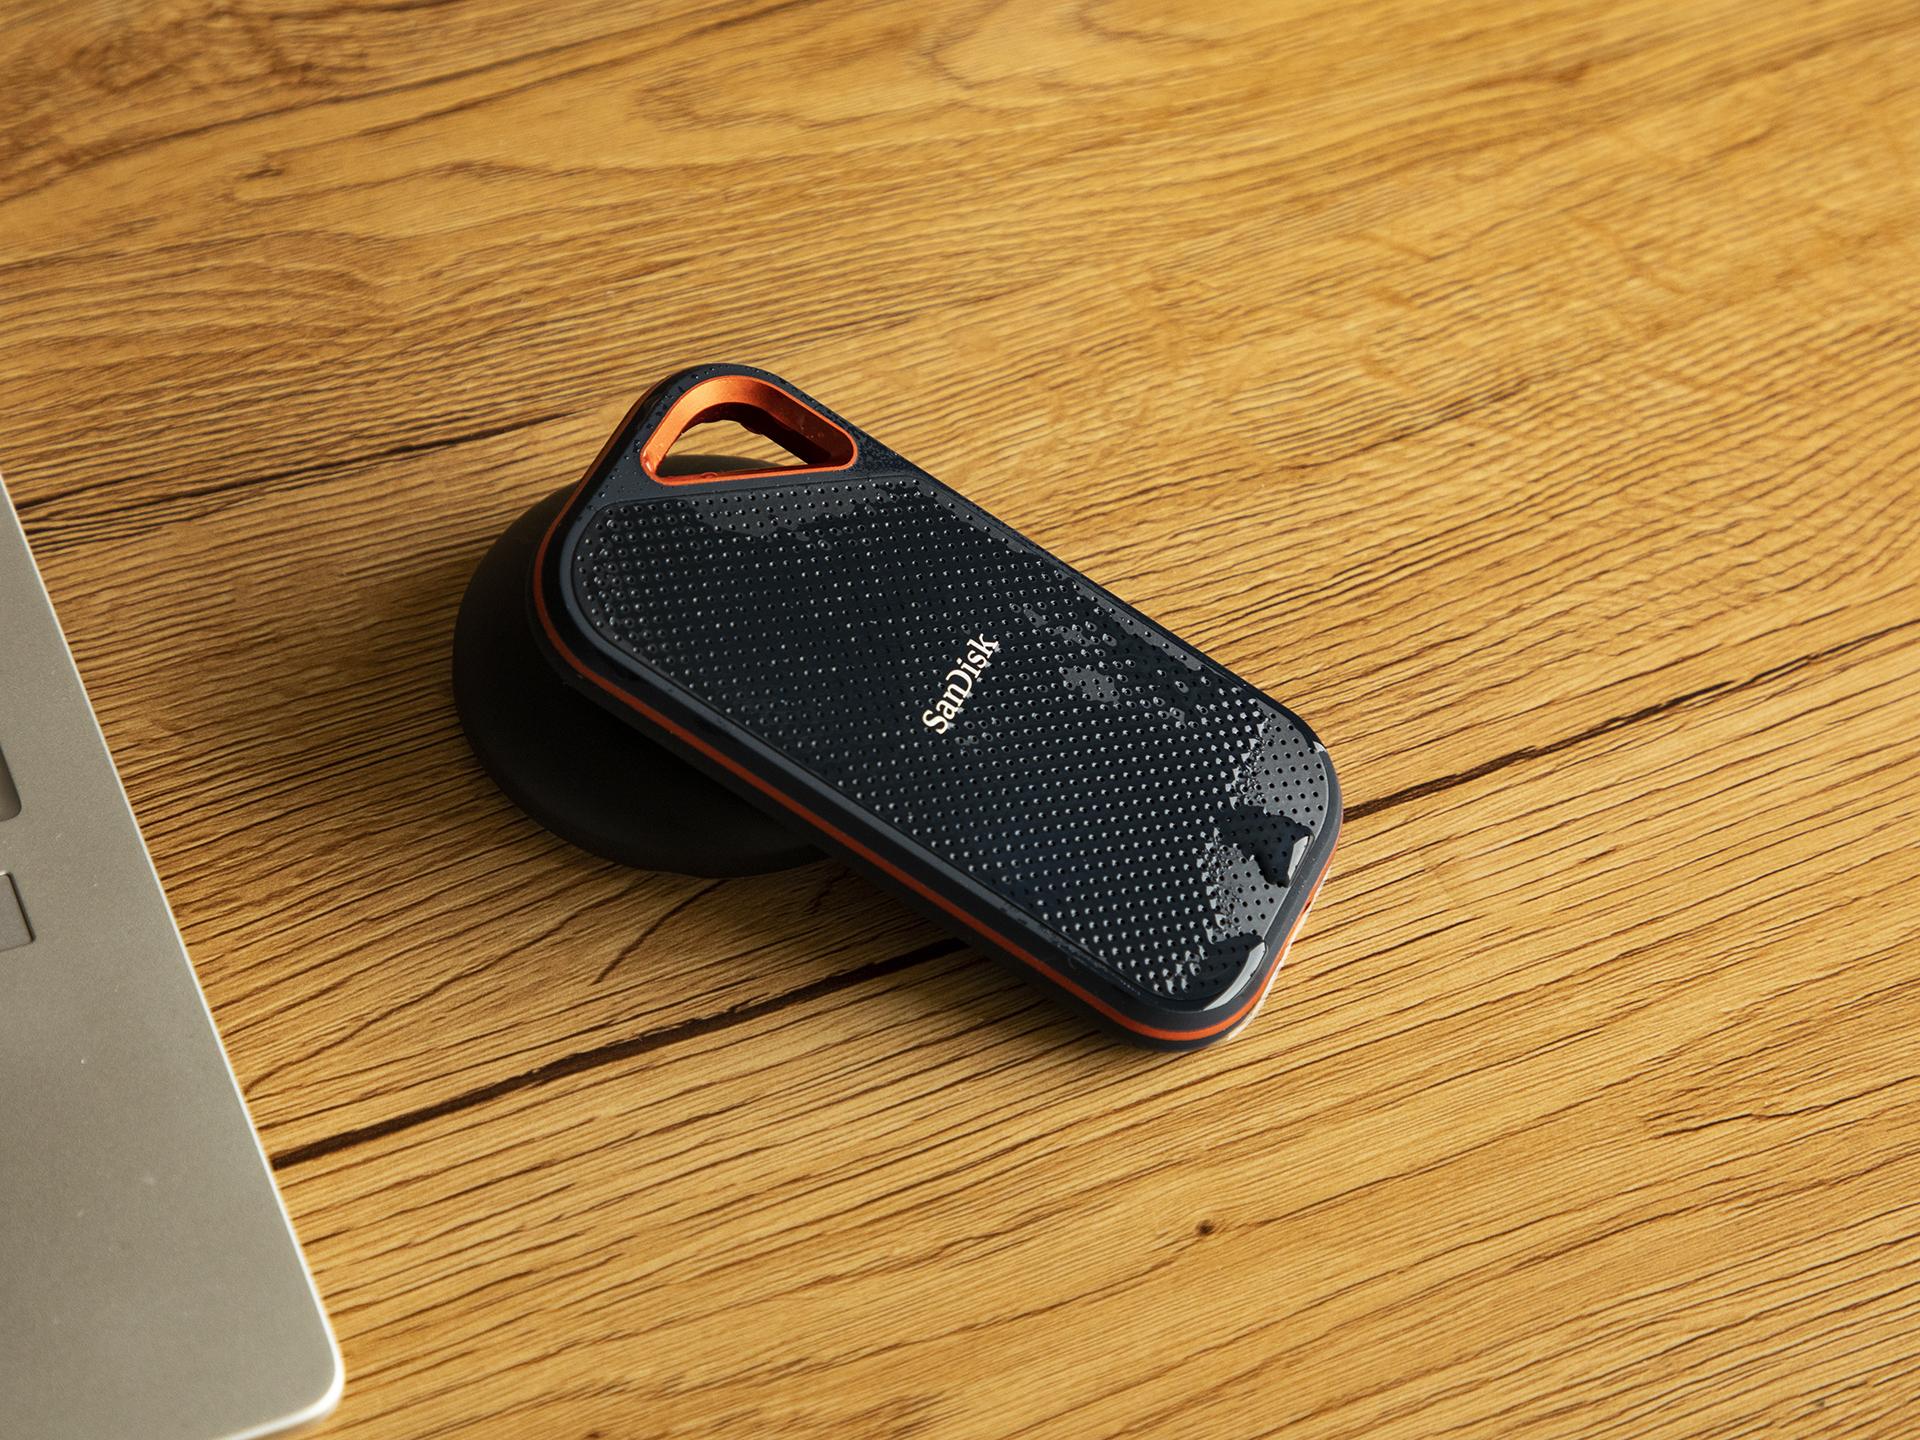 ip55级防尘防水 这款移动固态硬盘兼顾性能和实用图片